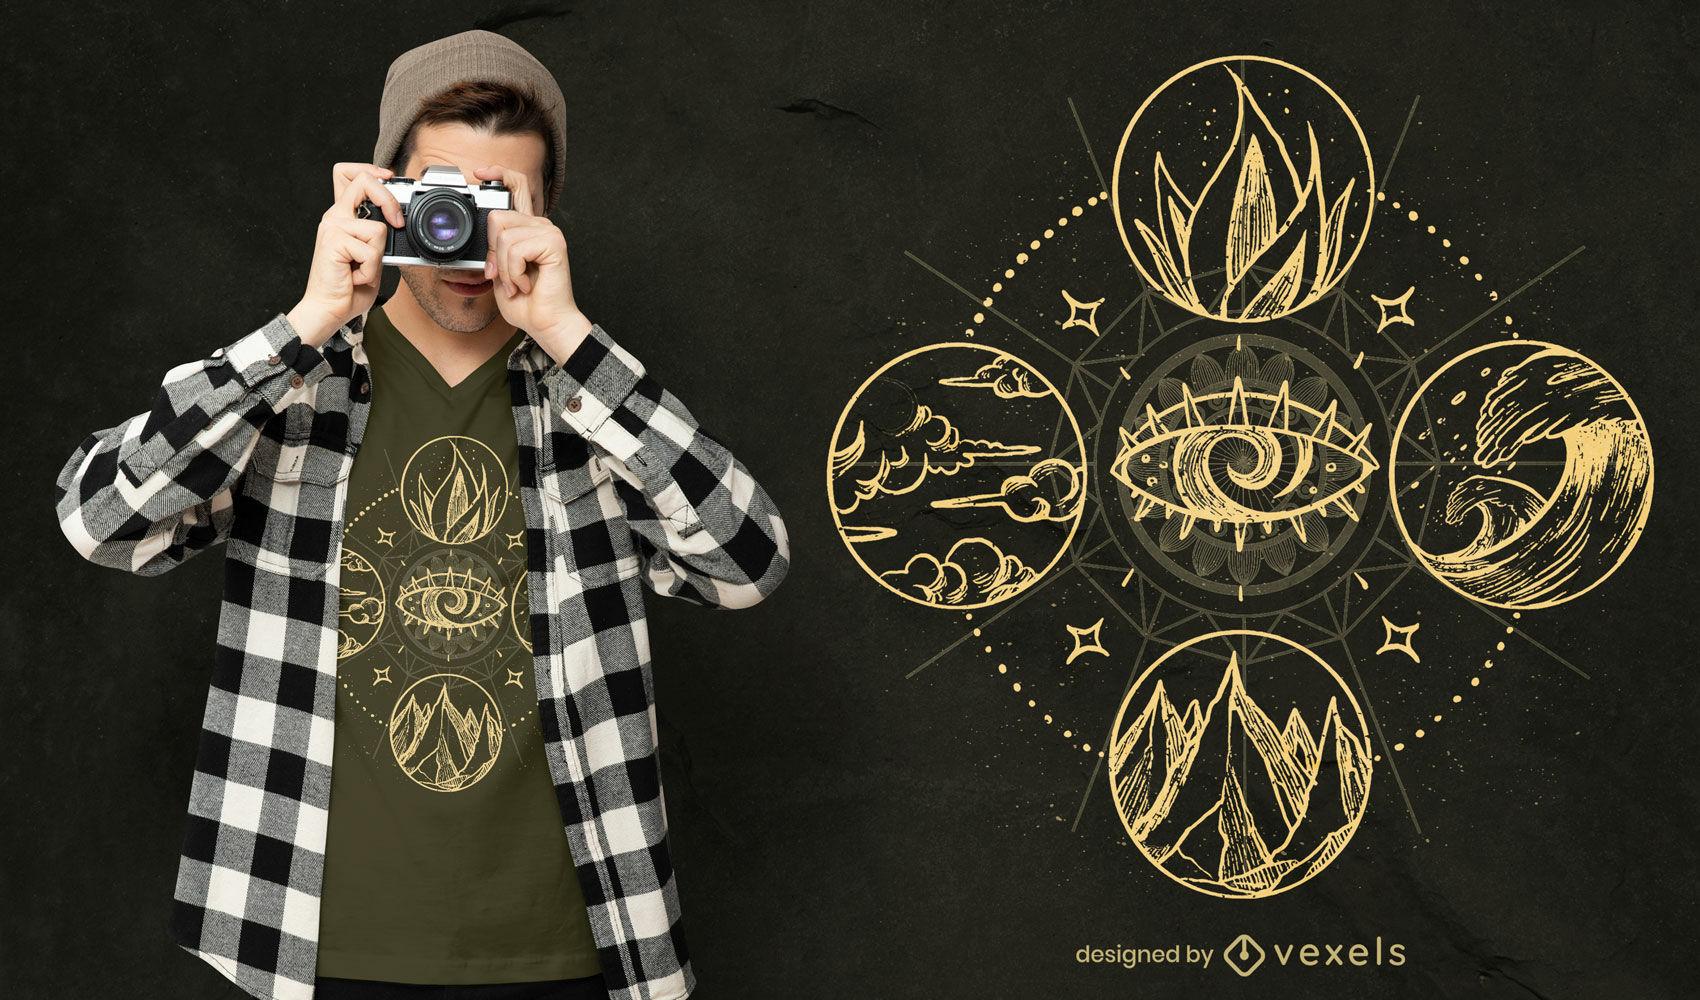 Diseño de camiseta de cuatro elementos naturaleza dibujada a mano.